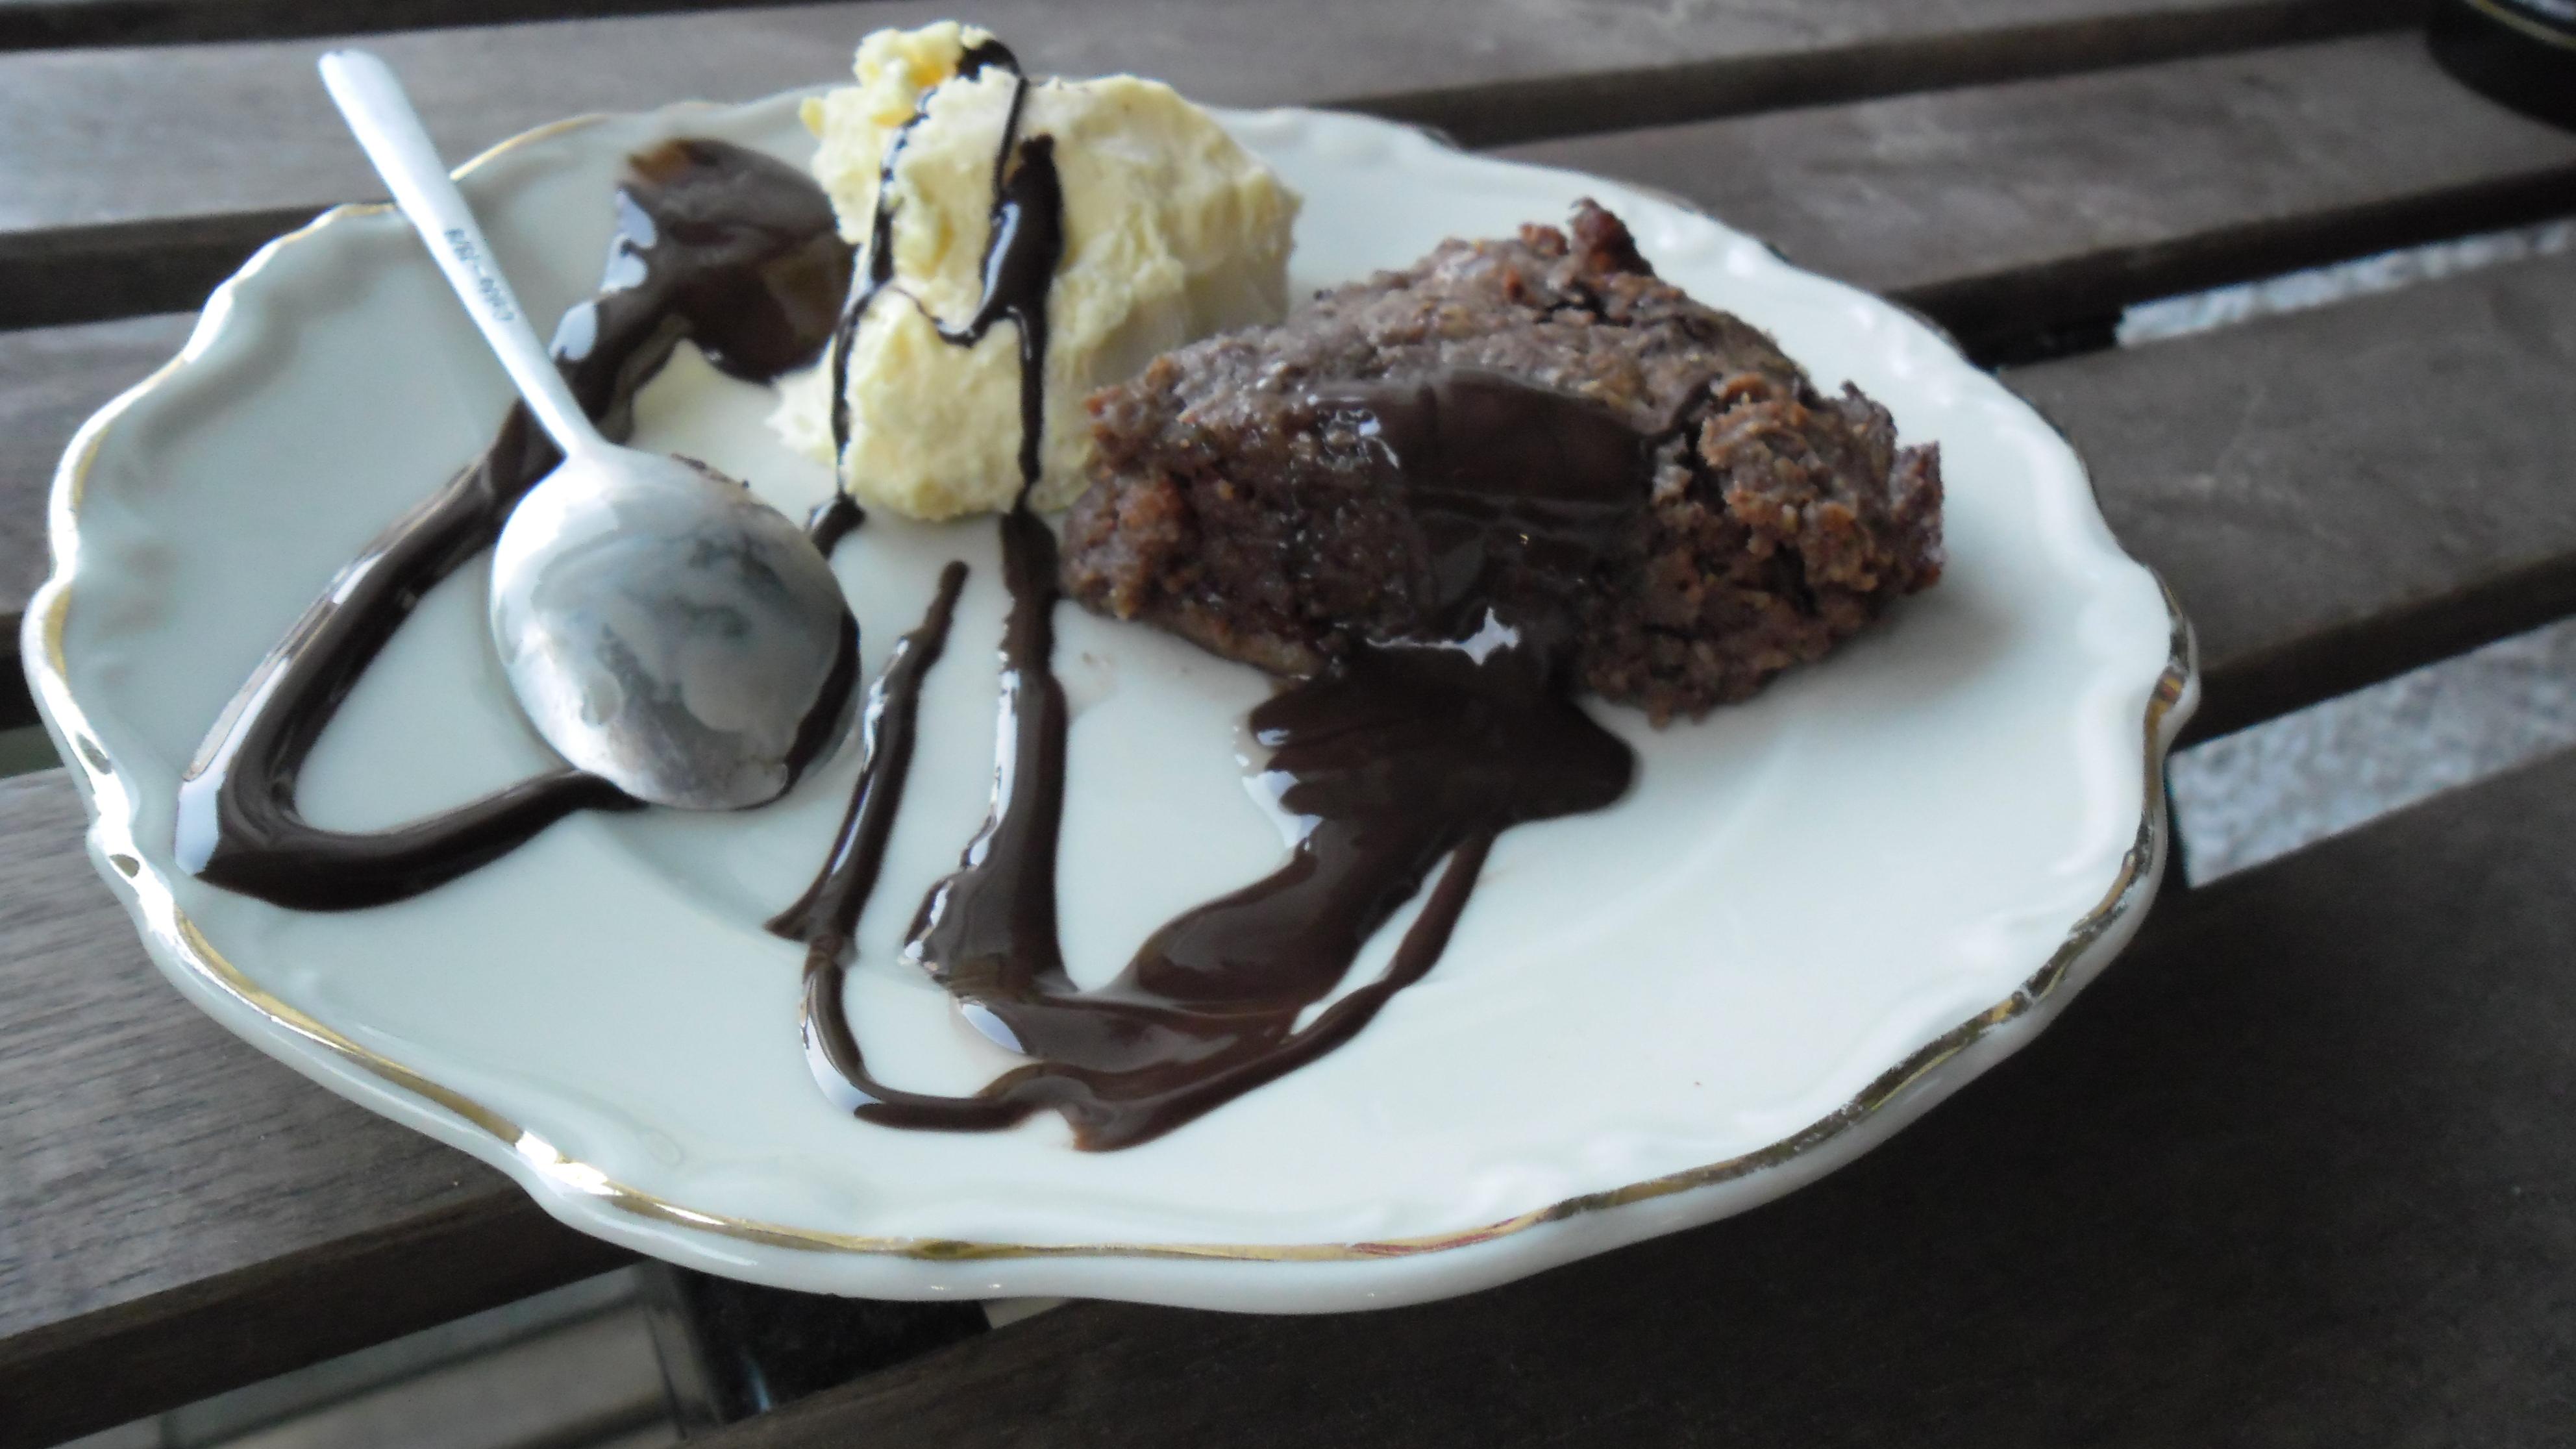 sockerfri socker kaka